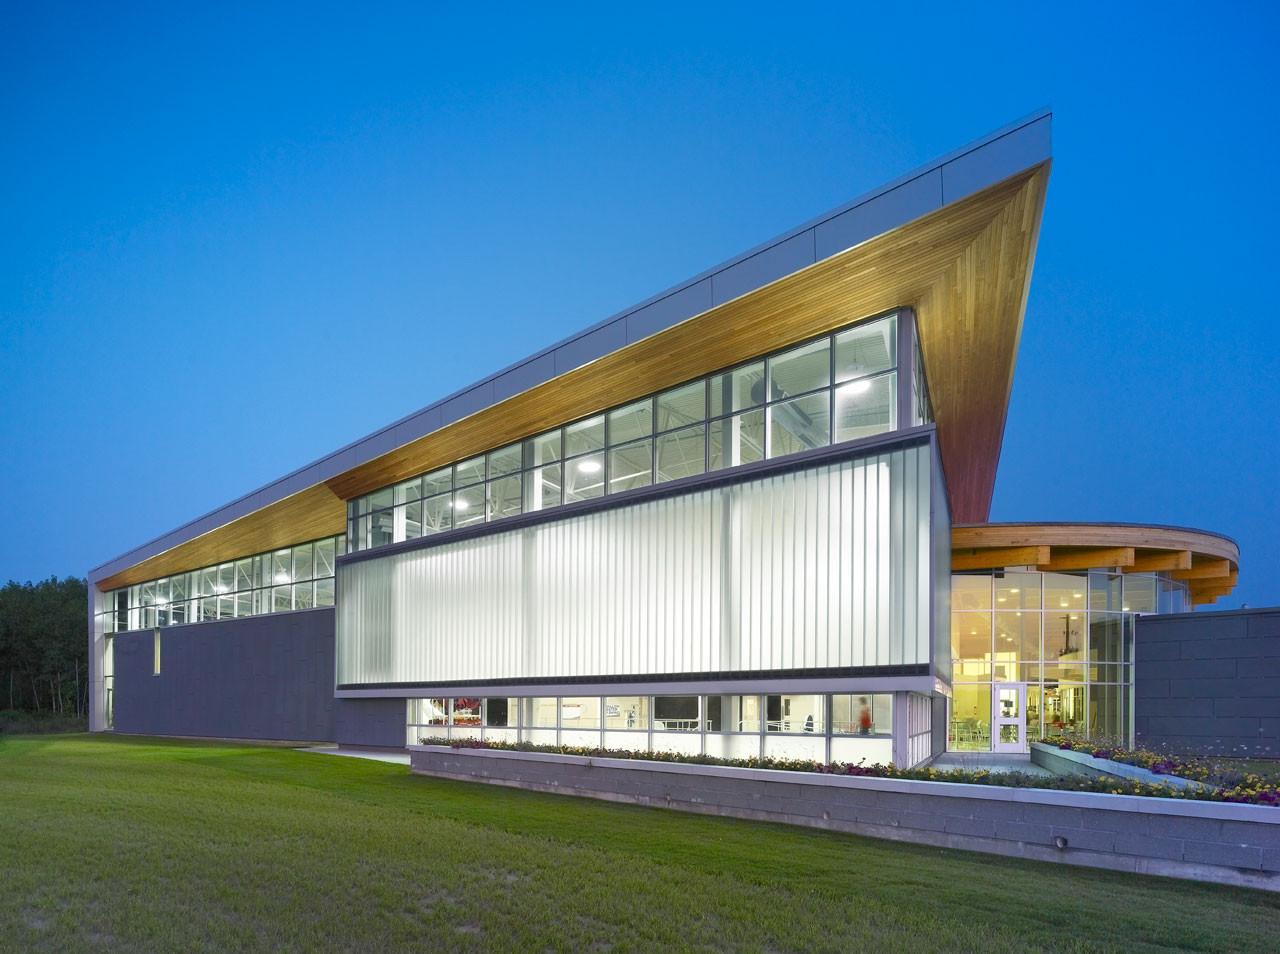 Quinte West YMCA / Architects Tillmann Ruth Robinson, © Shai Gil